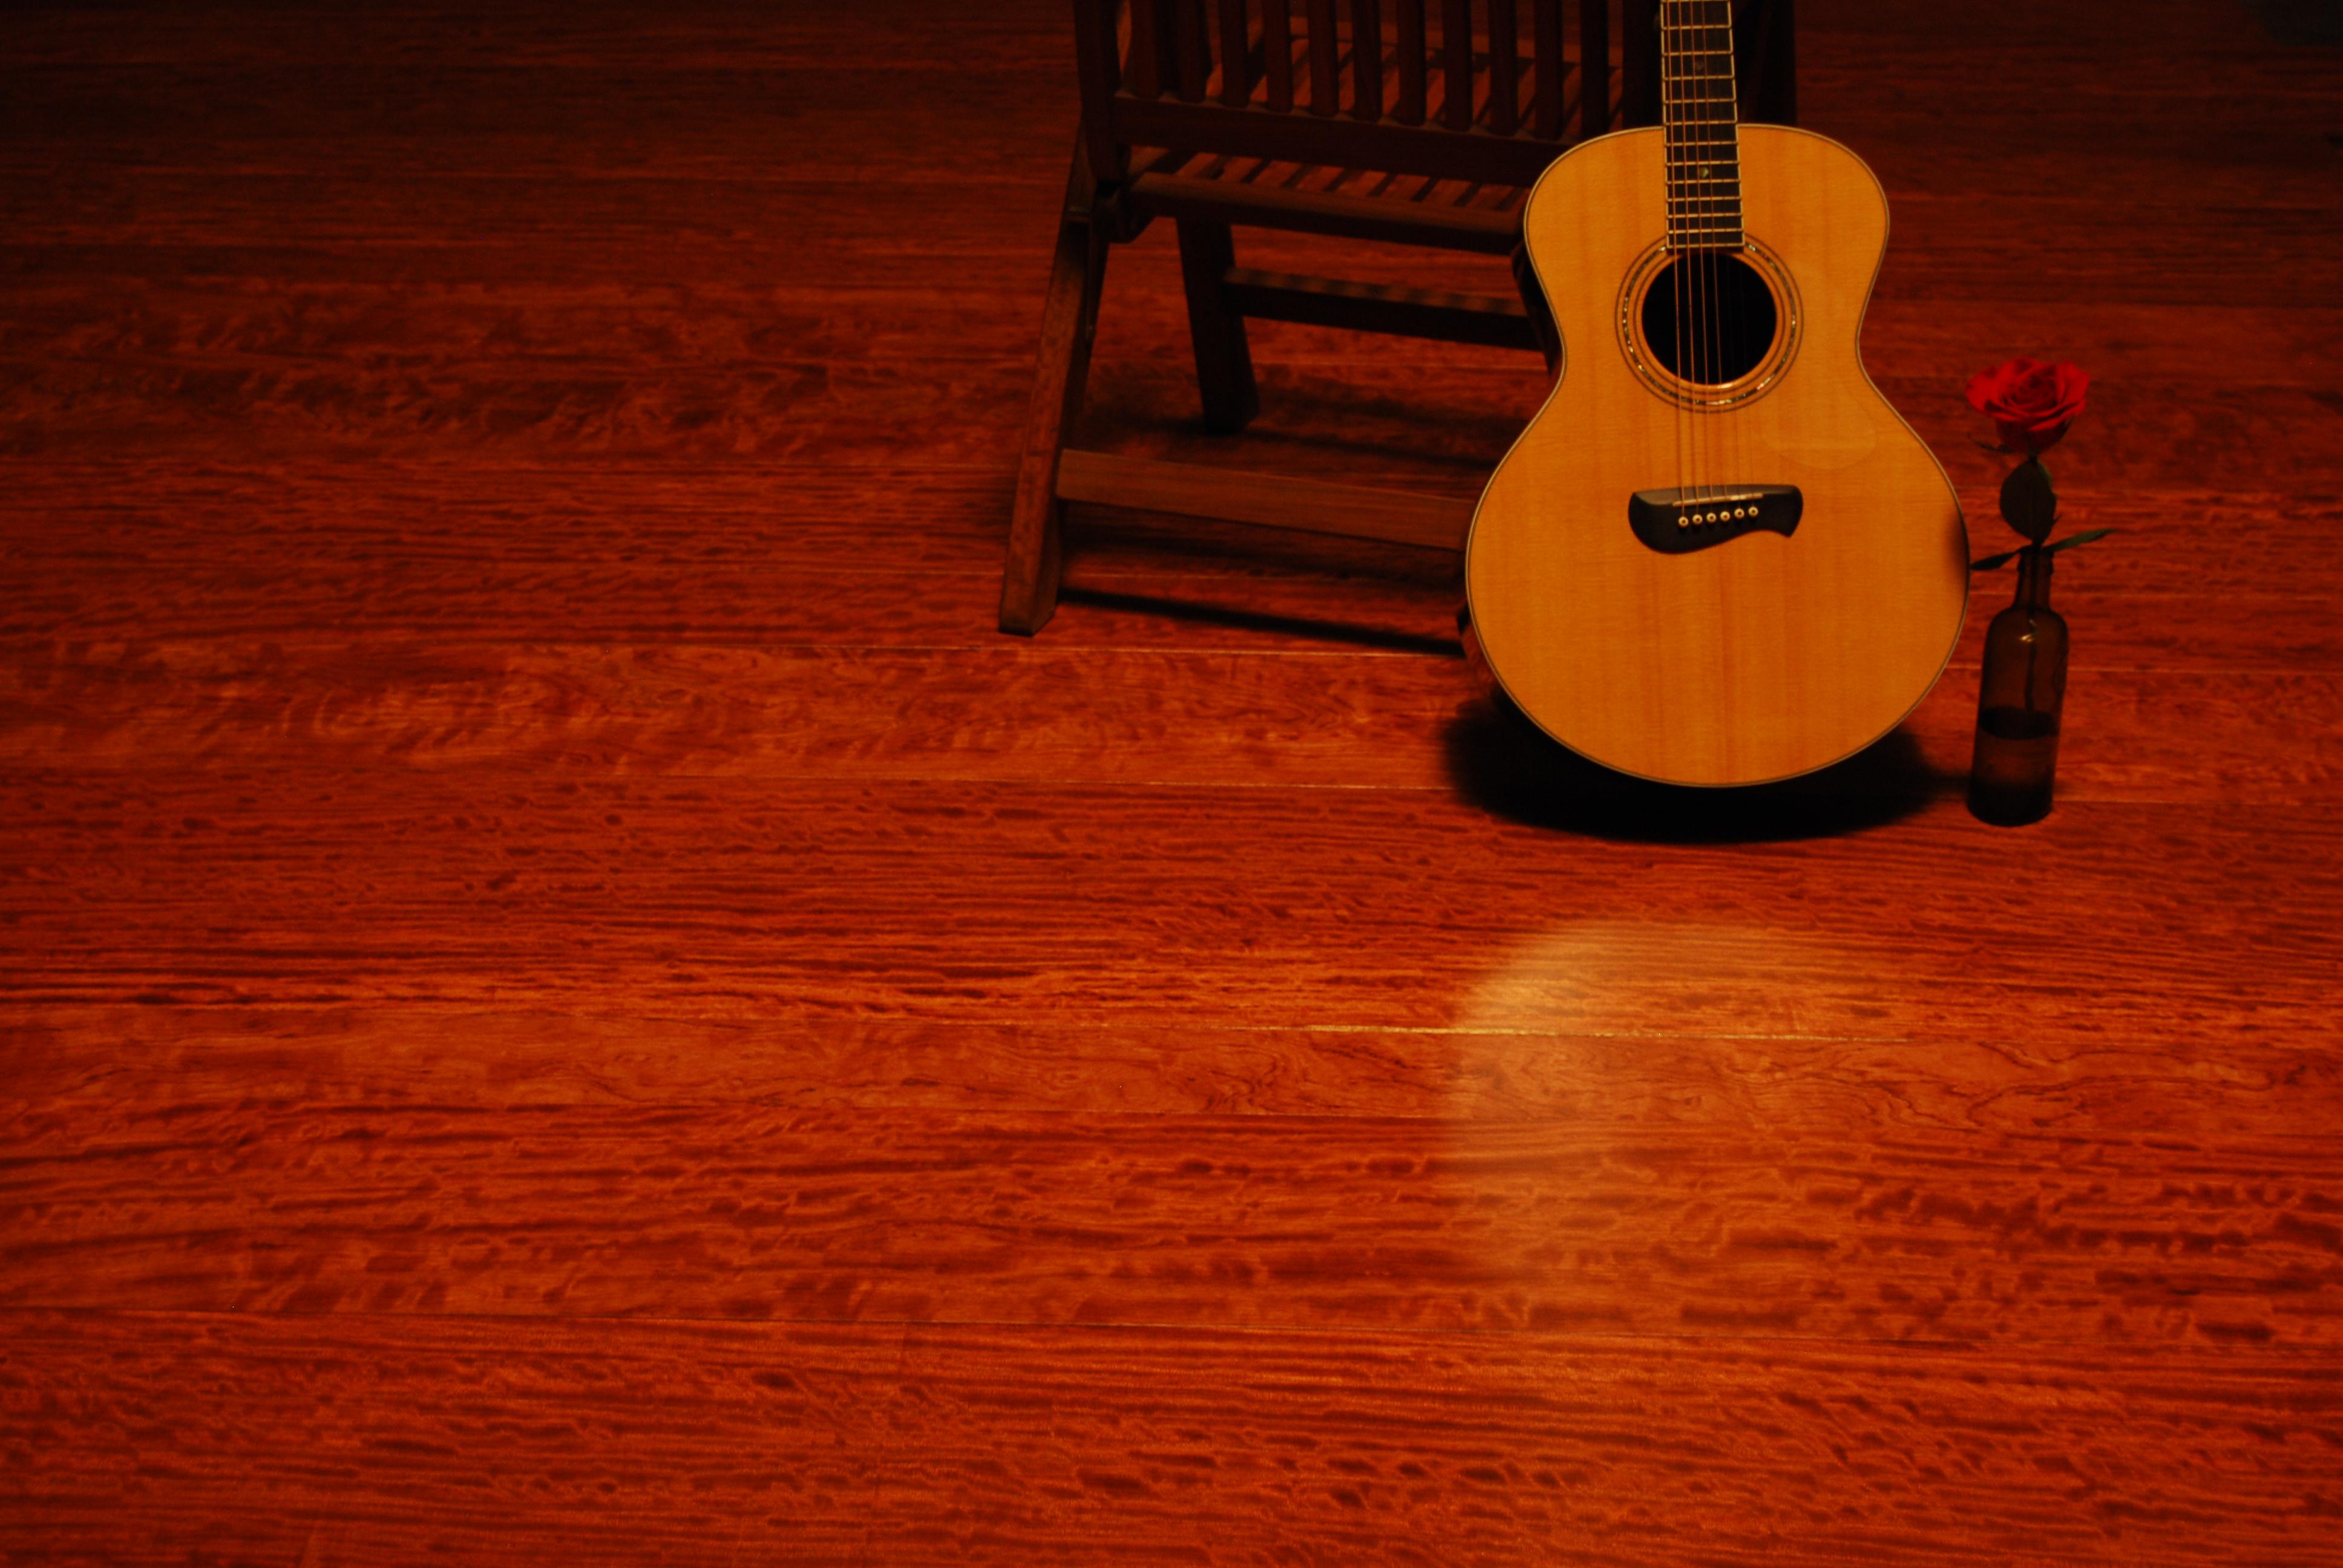 odie's-best-oil-finish-on-bubinga-hardwood-exotic-floor-0428.jpeg